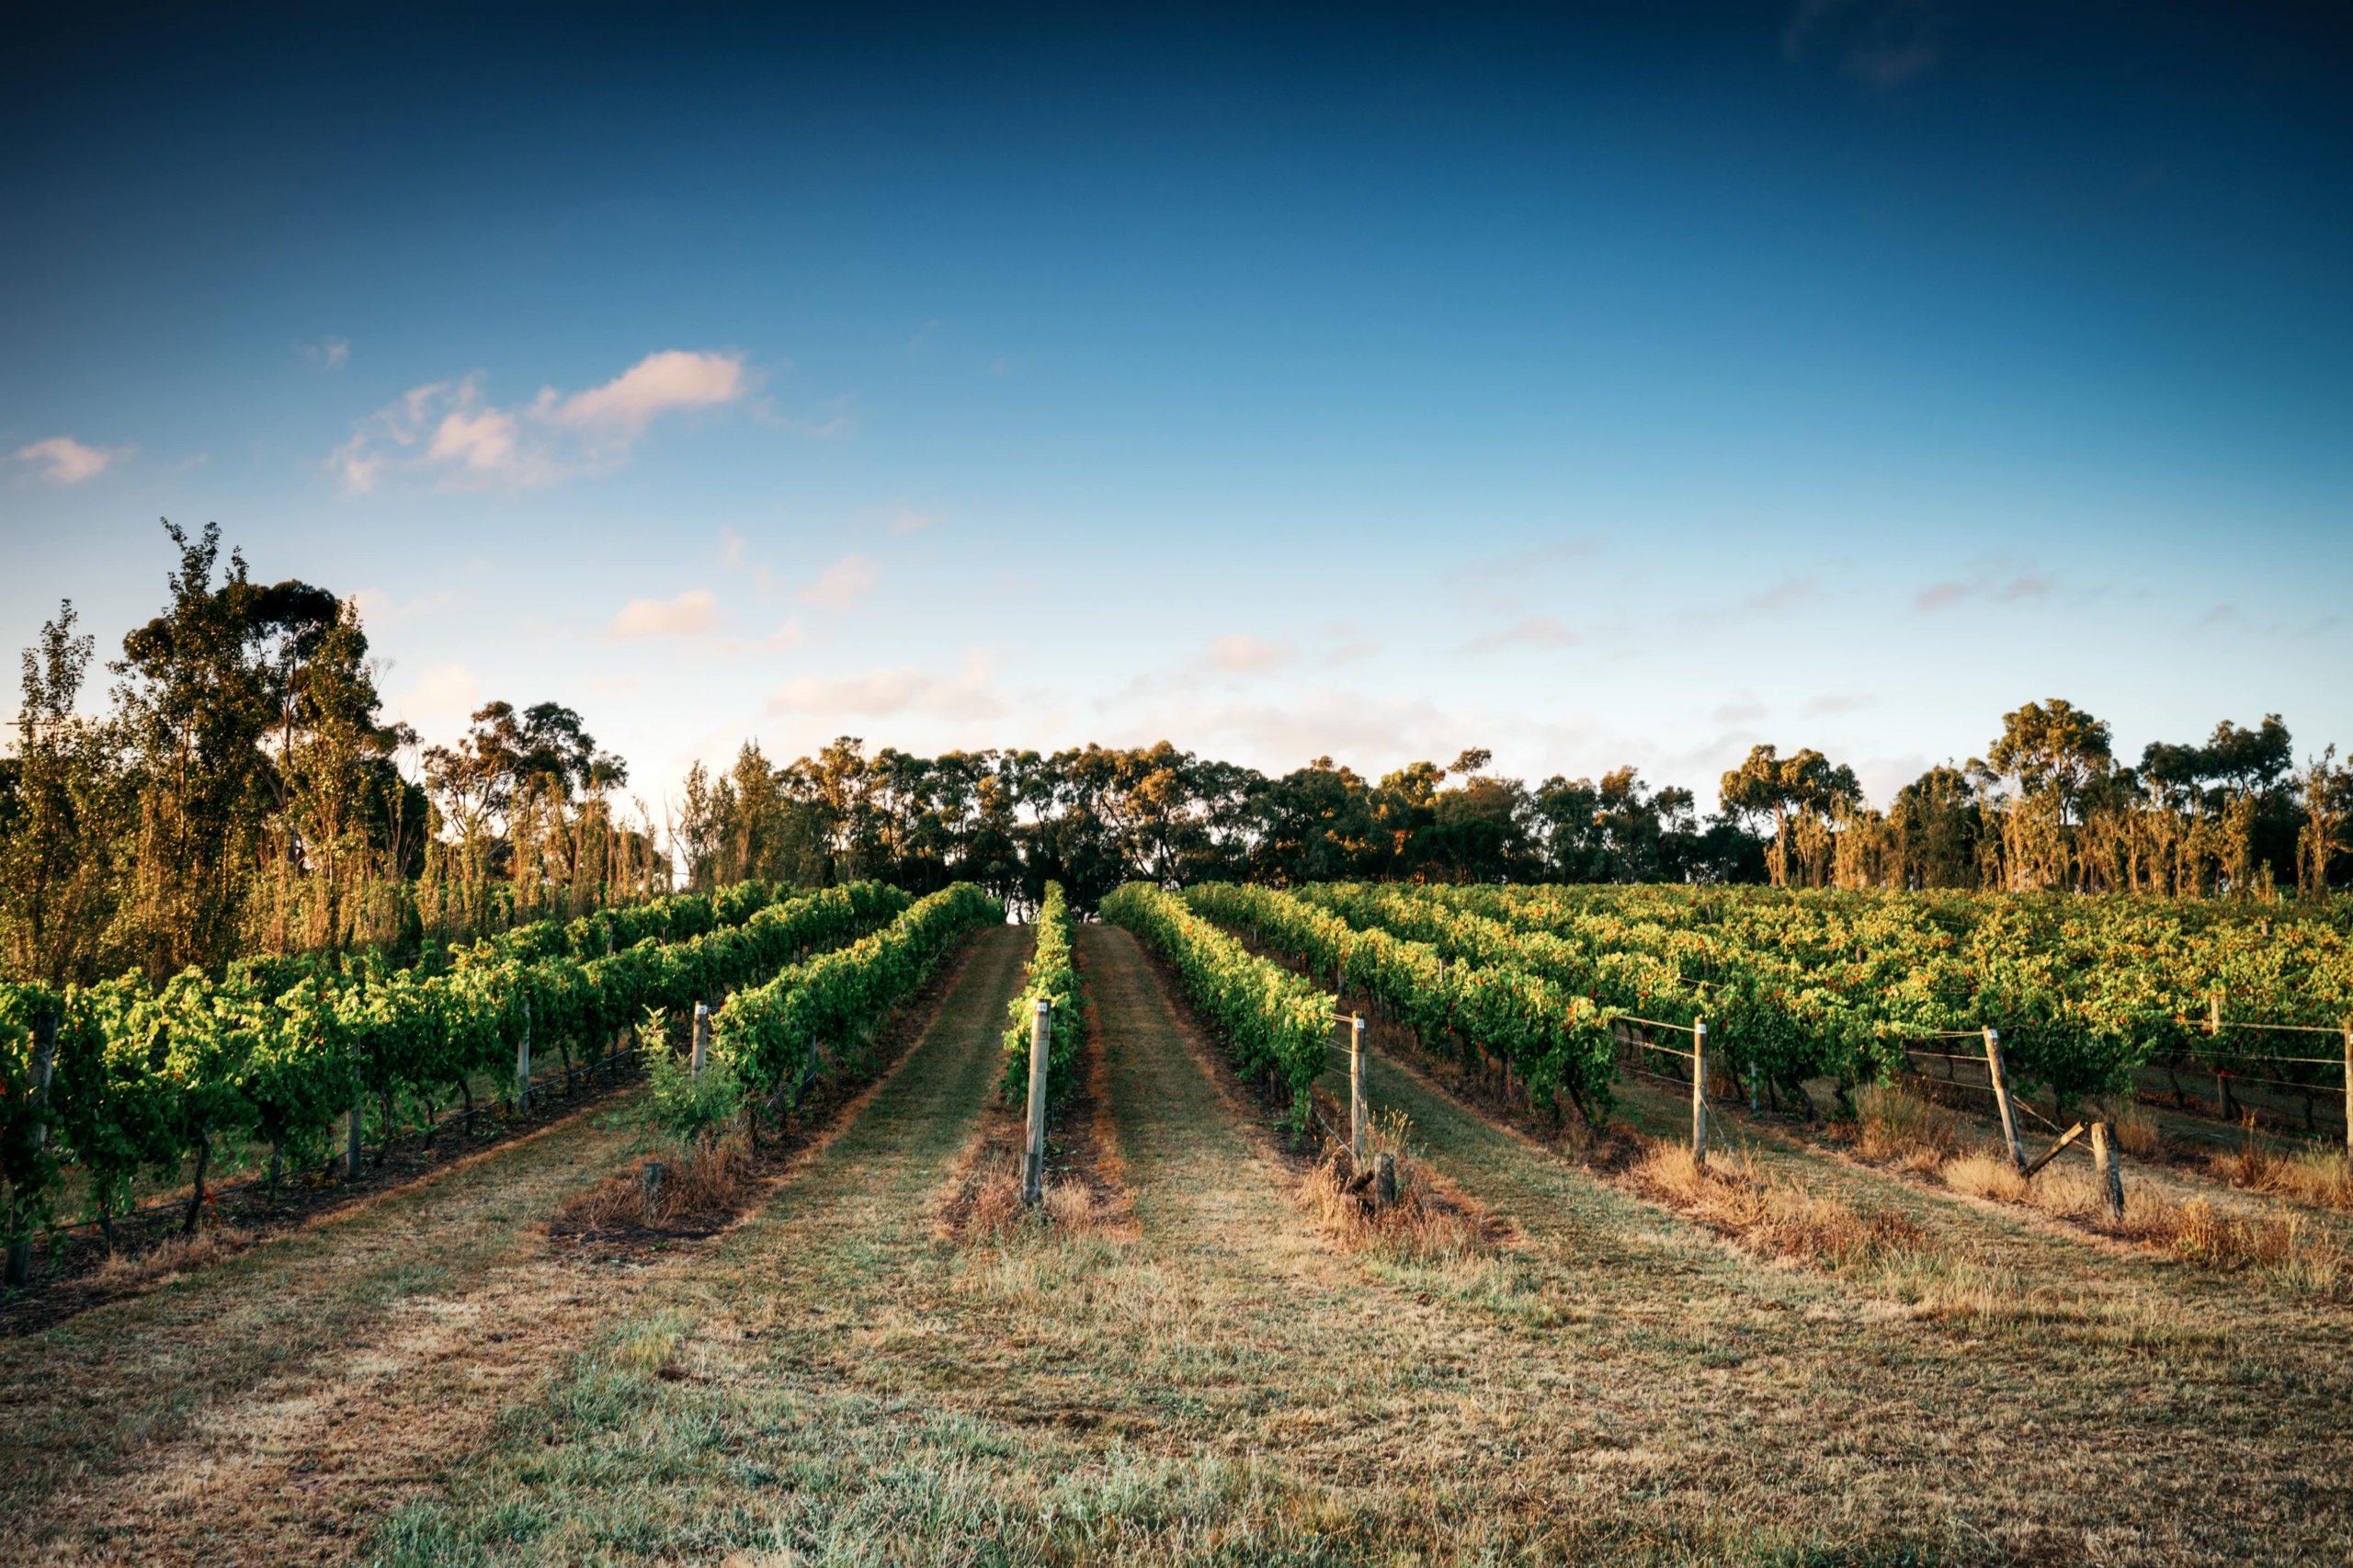 Webp.Scotchmans Hill - Day Vineyards